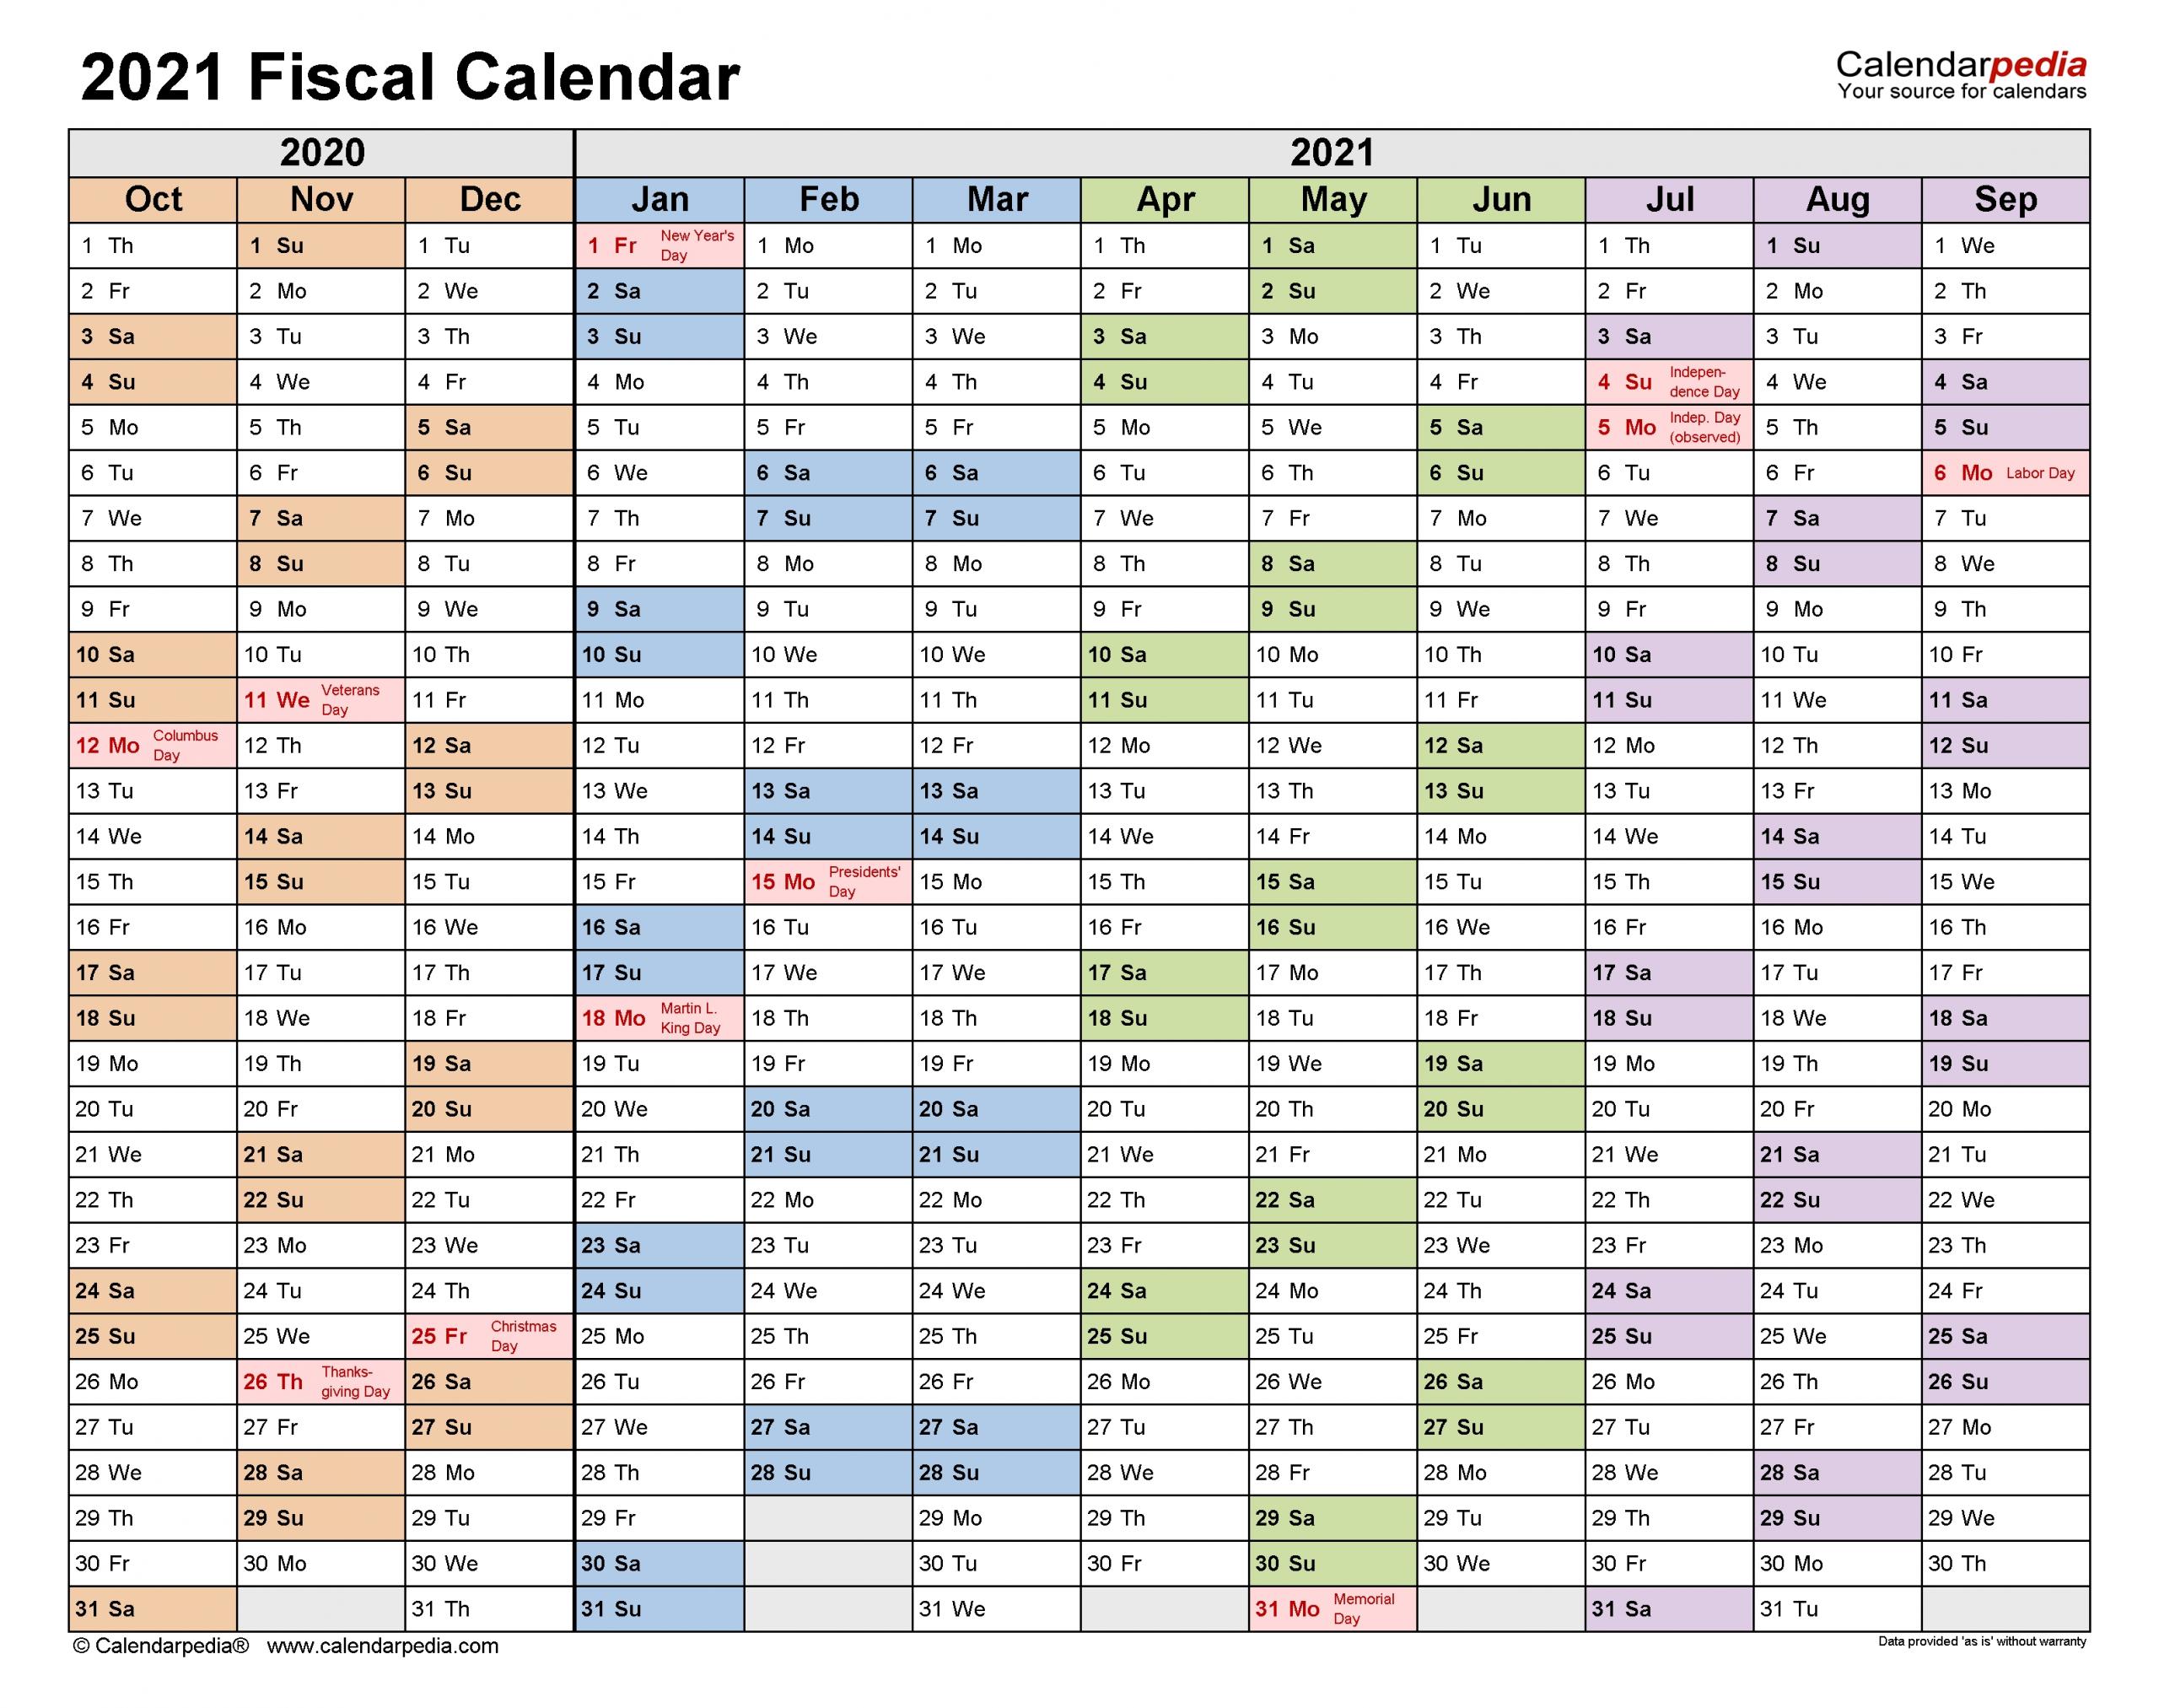 Take Accounting Calendar Vs Weekly Calendar